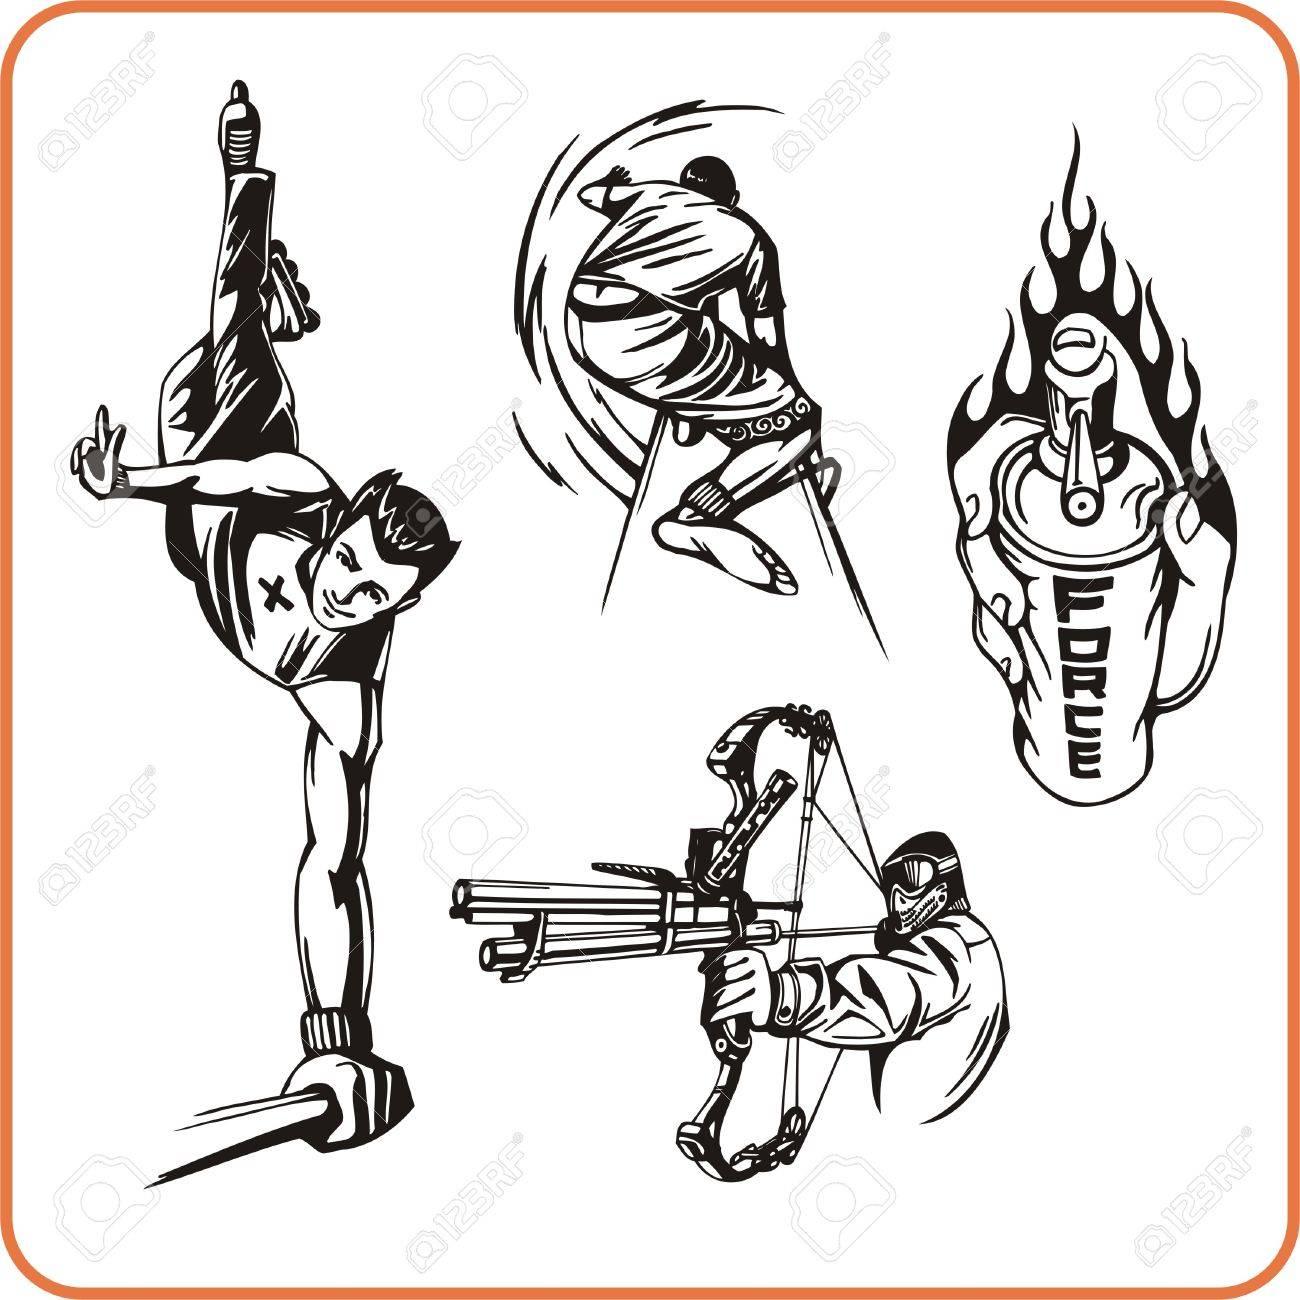 Extreme sport. Vector illustration. Vinyl-ready Stock Vector - 8070268